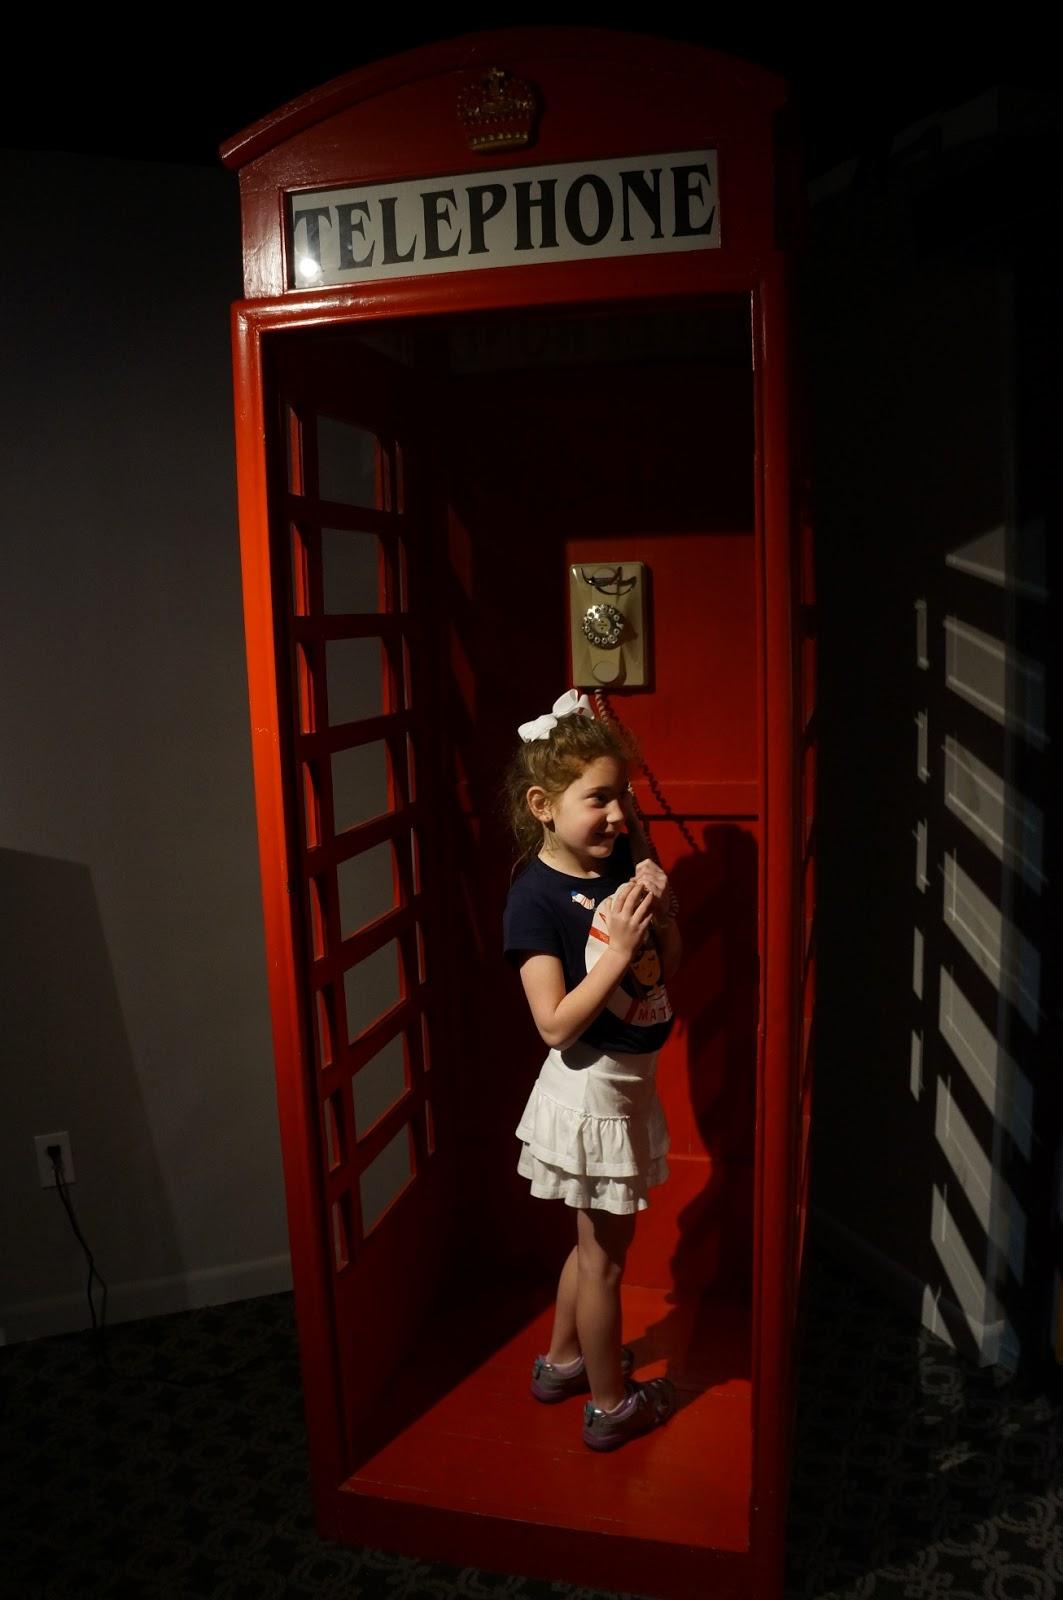 Queen Mary Engine Room: Evan And Lauren's Cool Blog: 4/26/13: The Queen Mary In